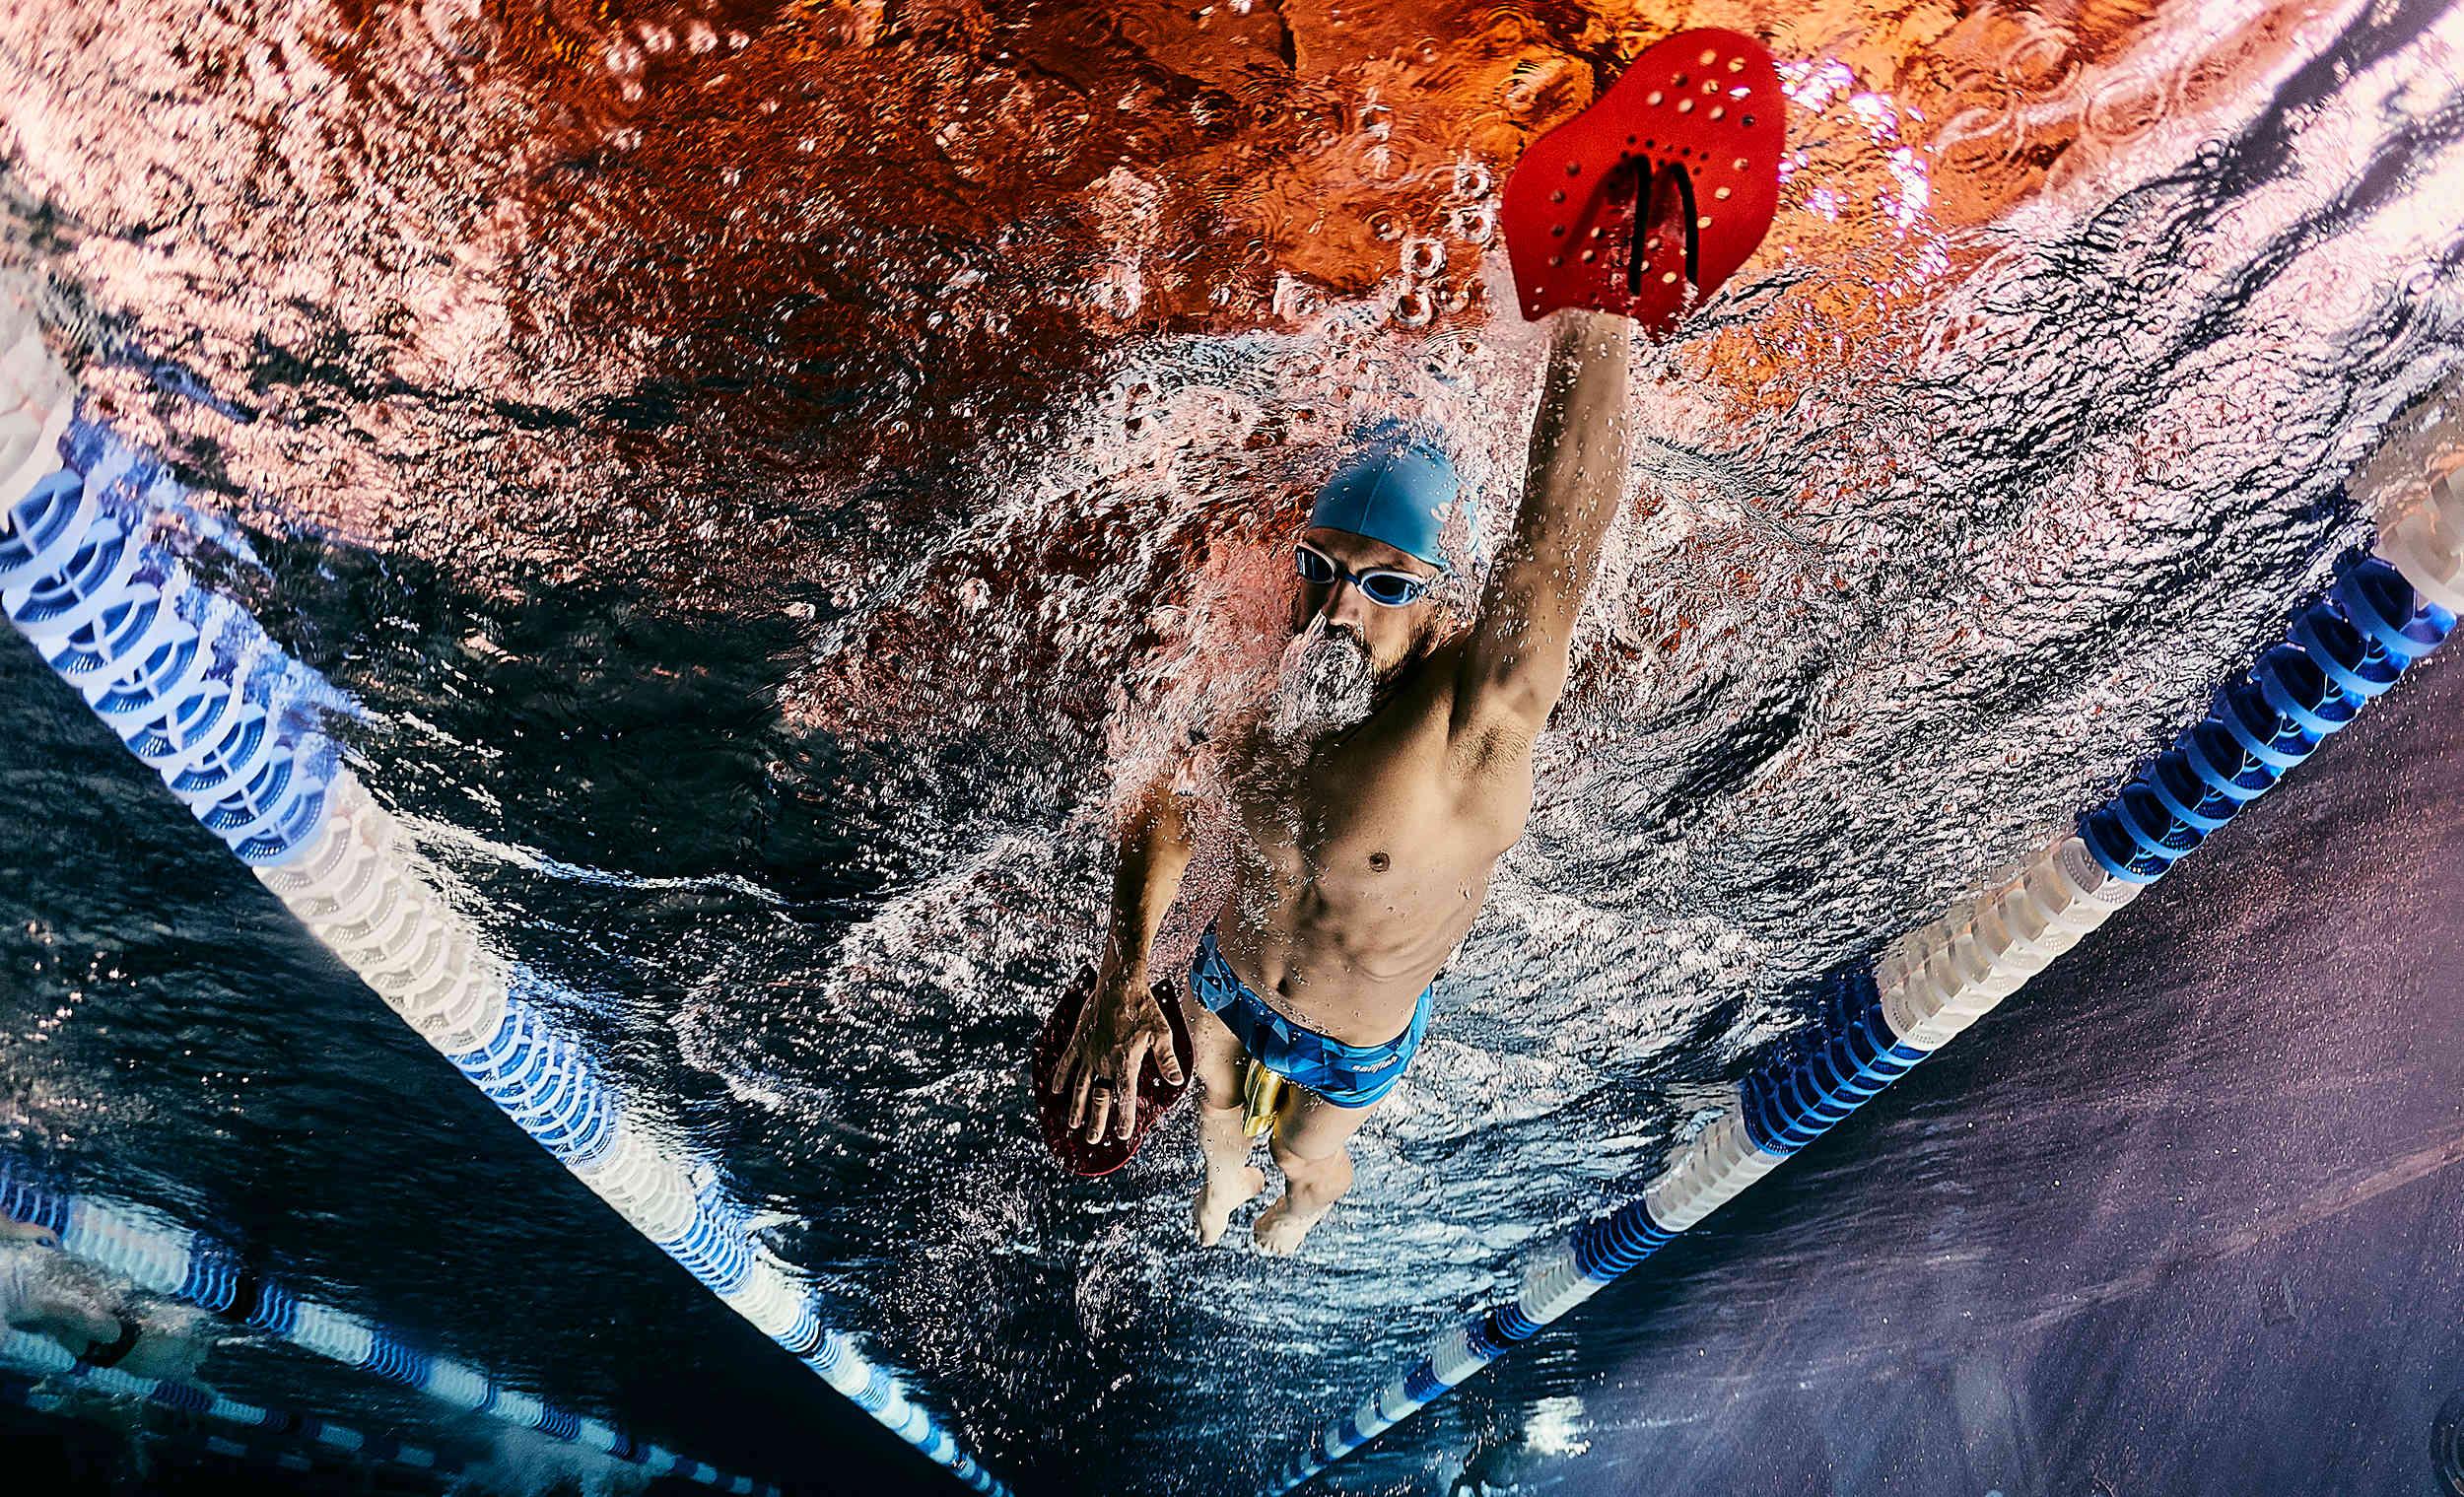 Triathlon Swimmer Patrick Lange